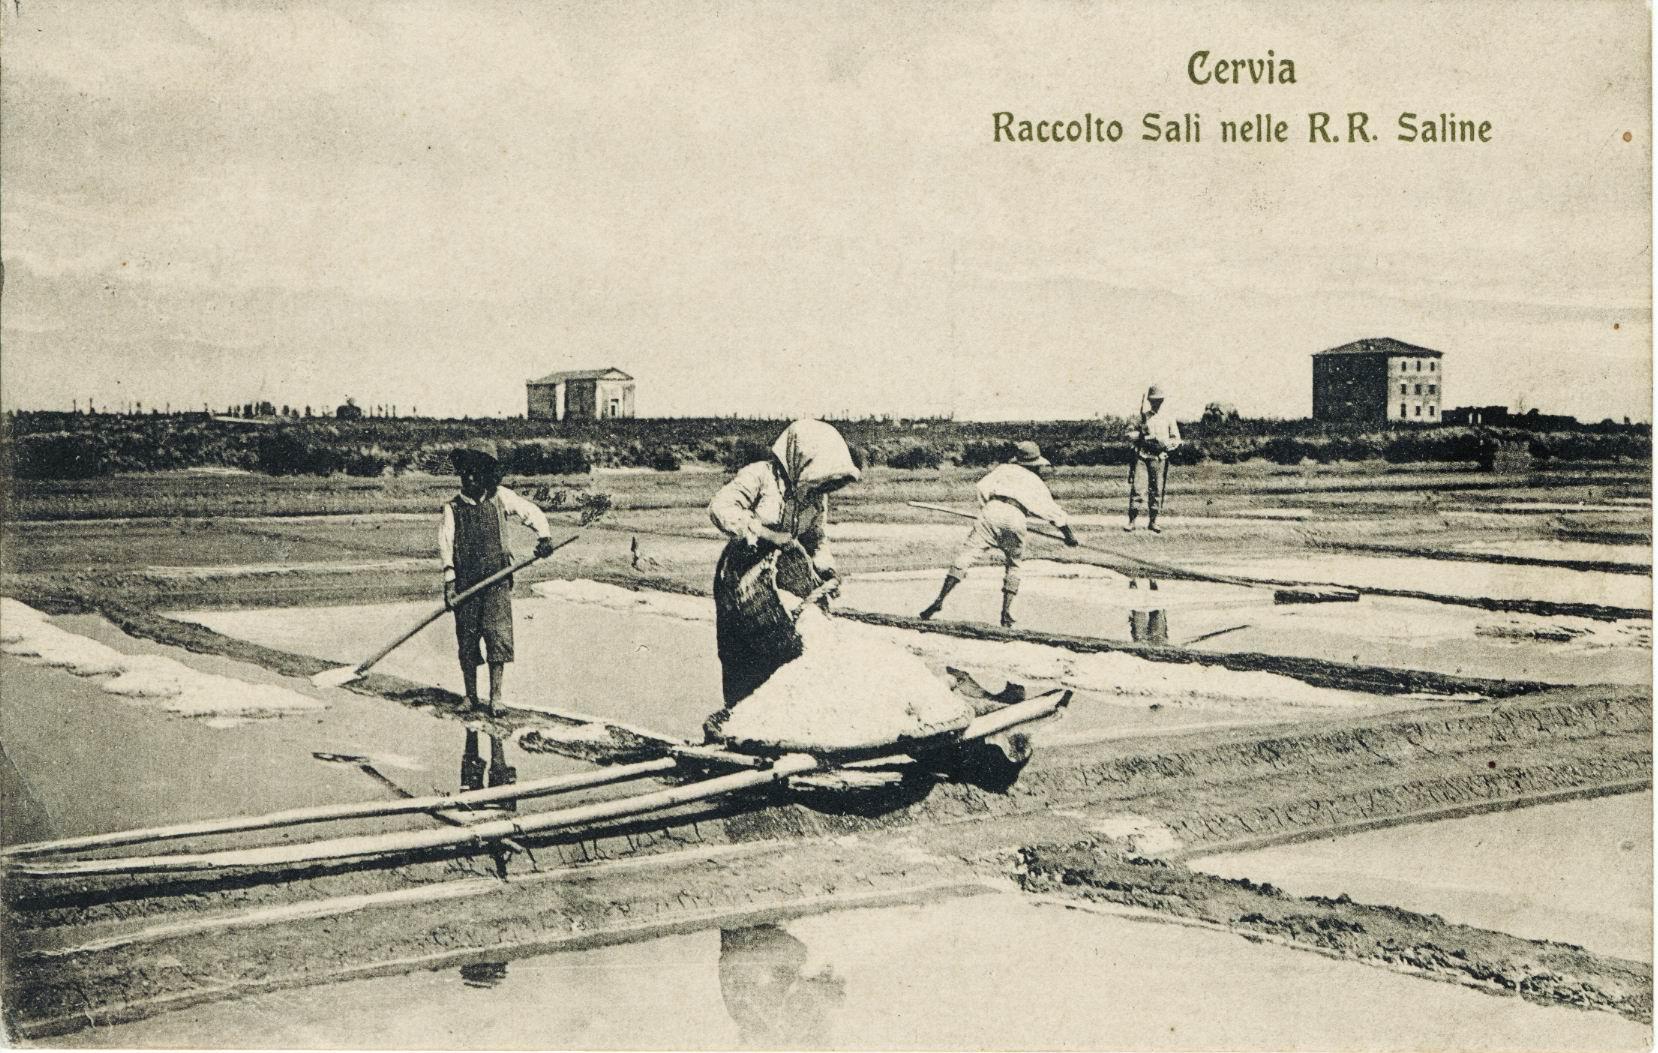 1908.Cervia. Raccolta sali nelle R.R. saline.